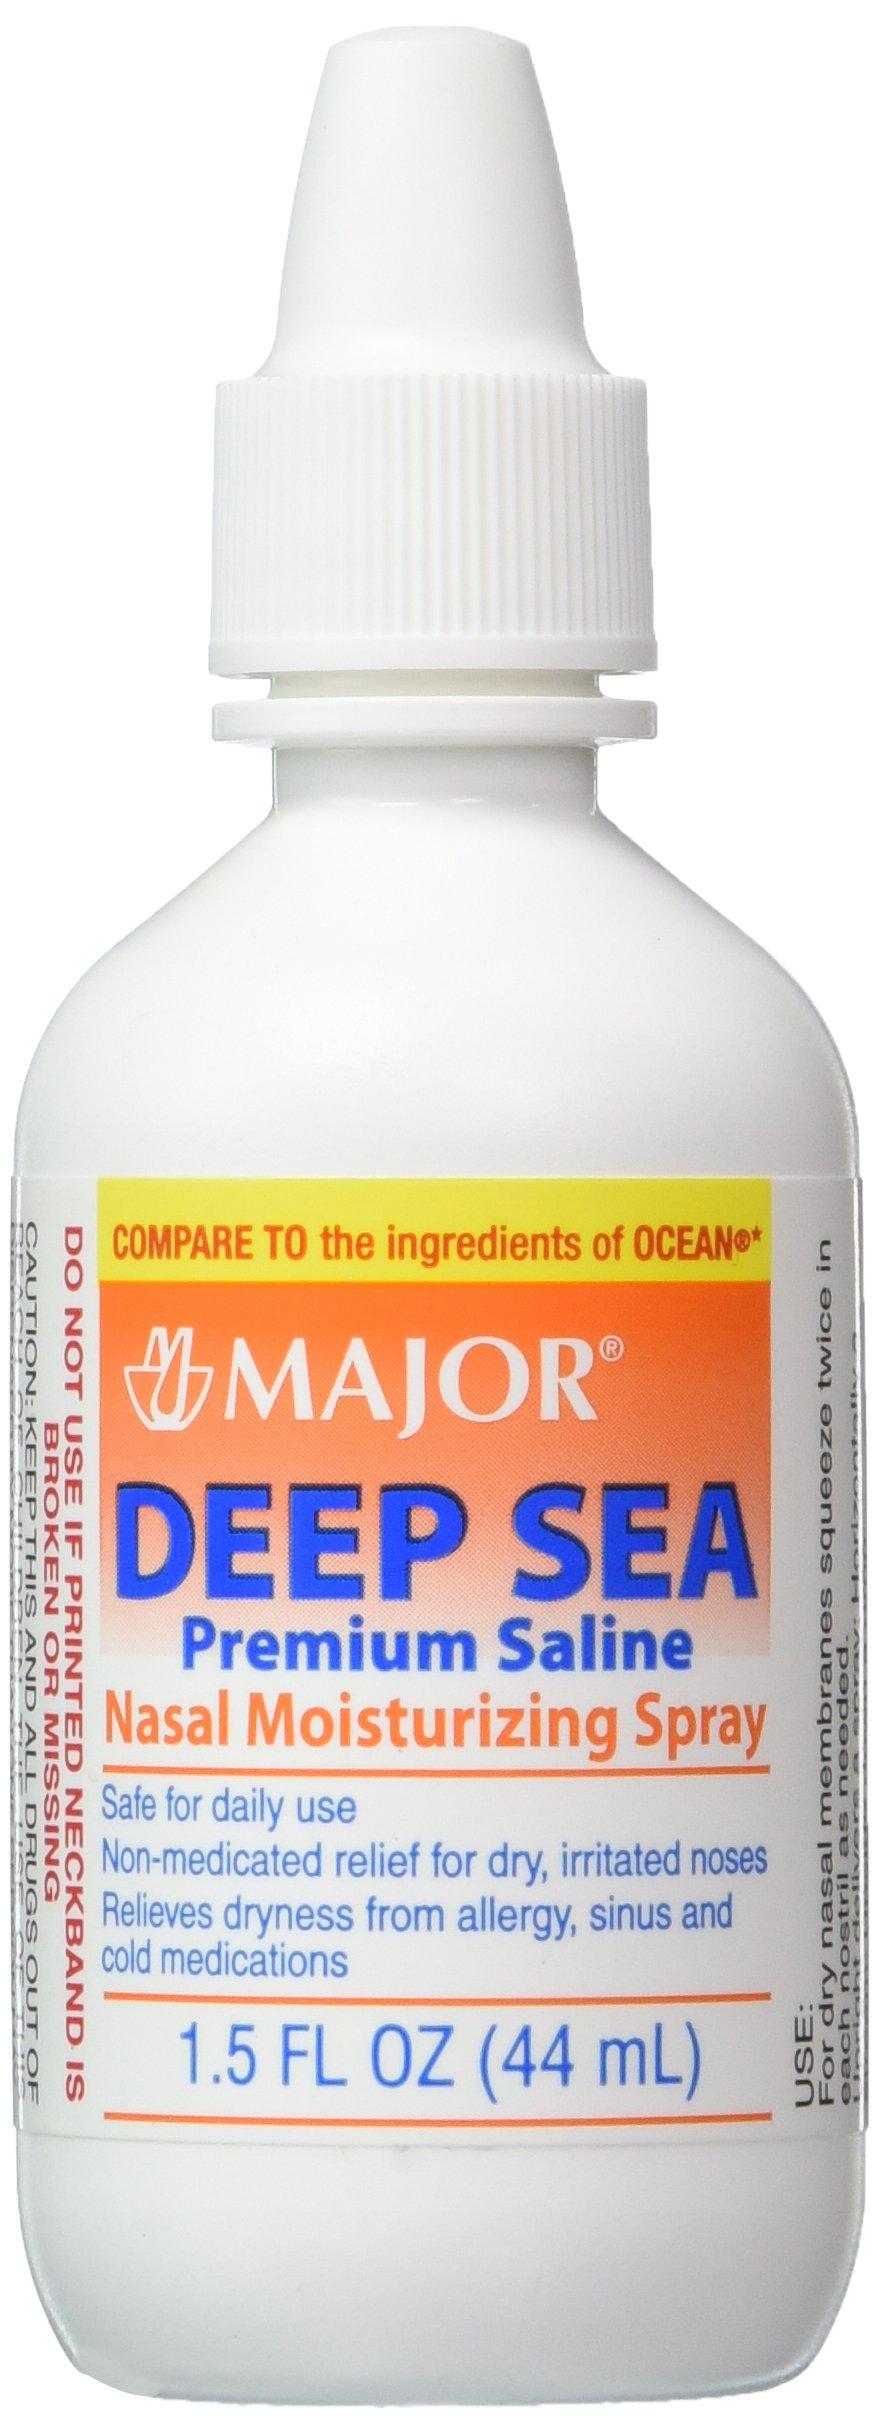 Deep Sea Saline Nasal Spray Generic for Ocean Nasal Moisturizing Spray 1.5 oz per Bottle Pack of 12 Bottles